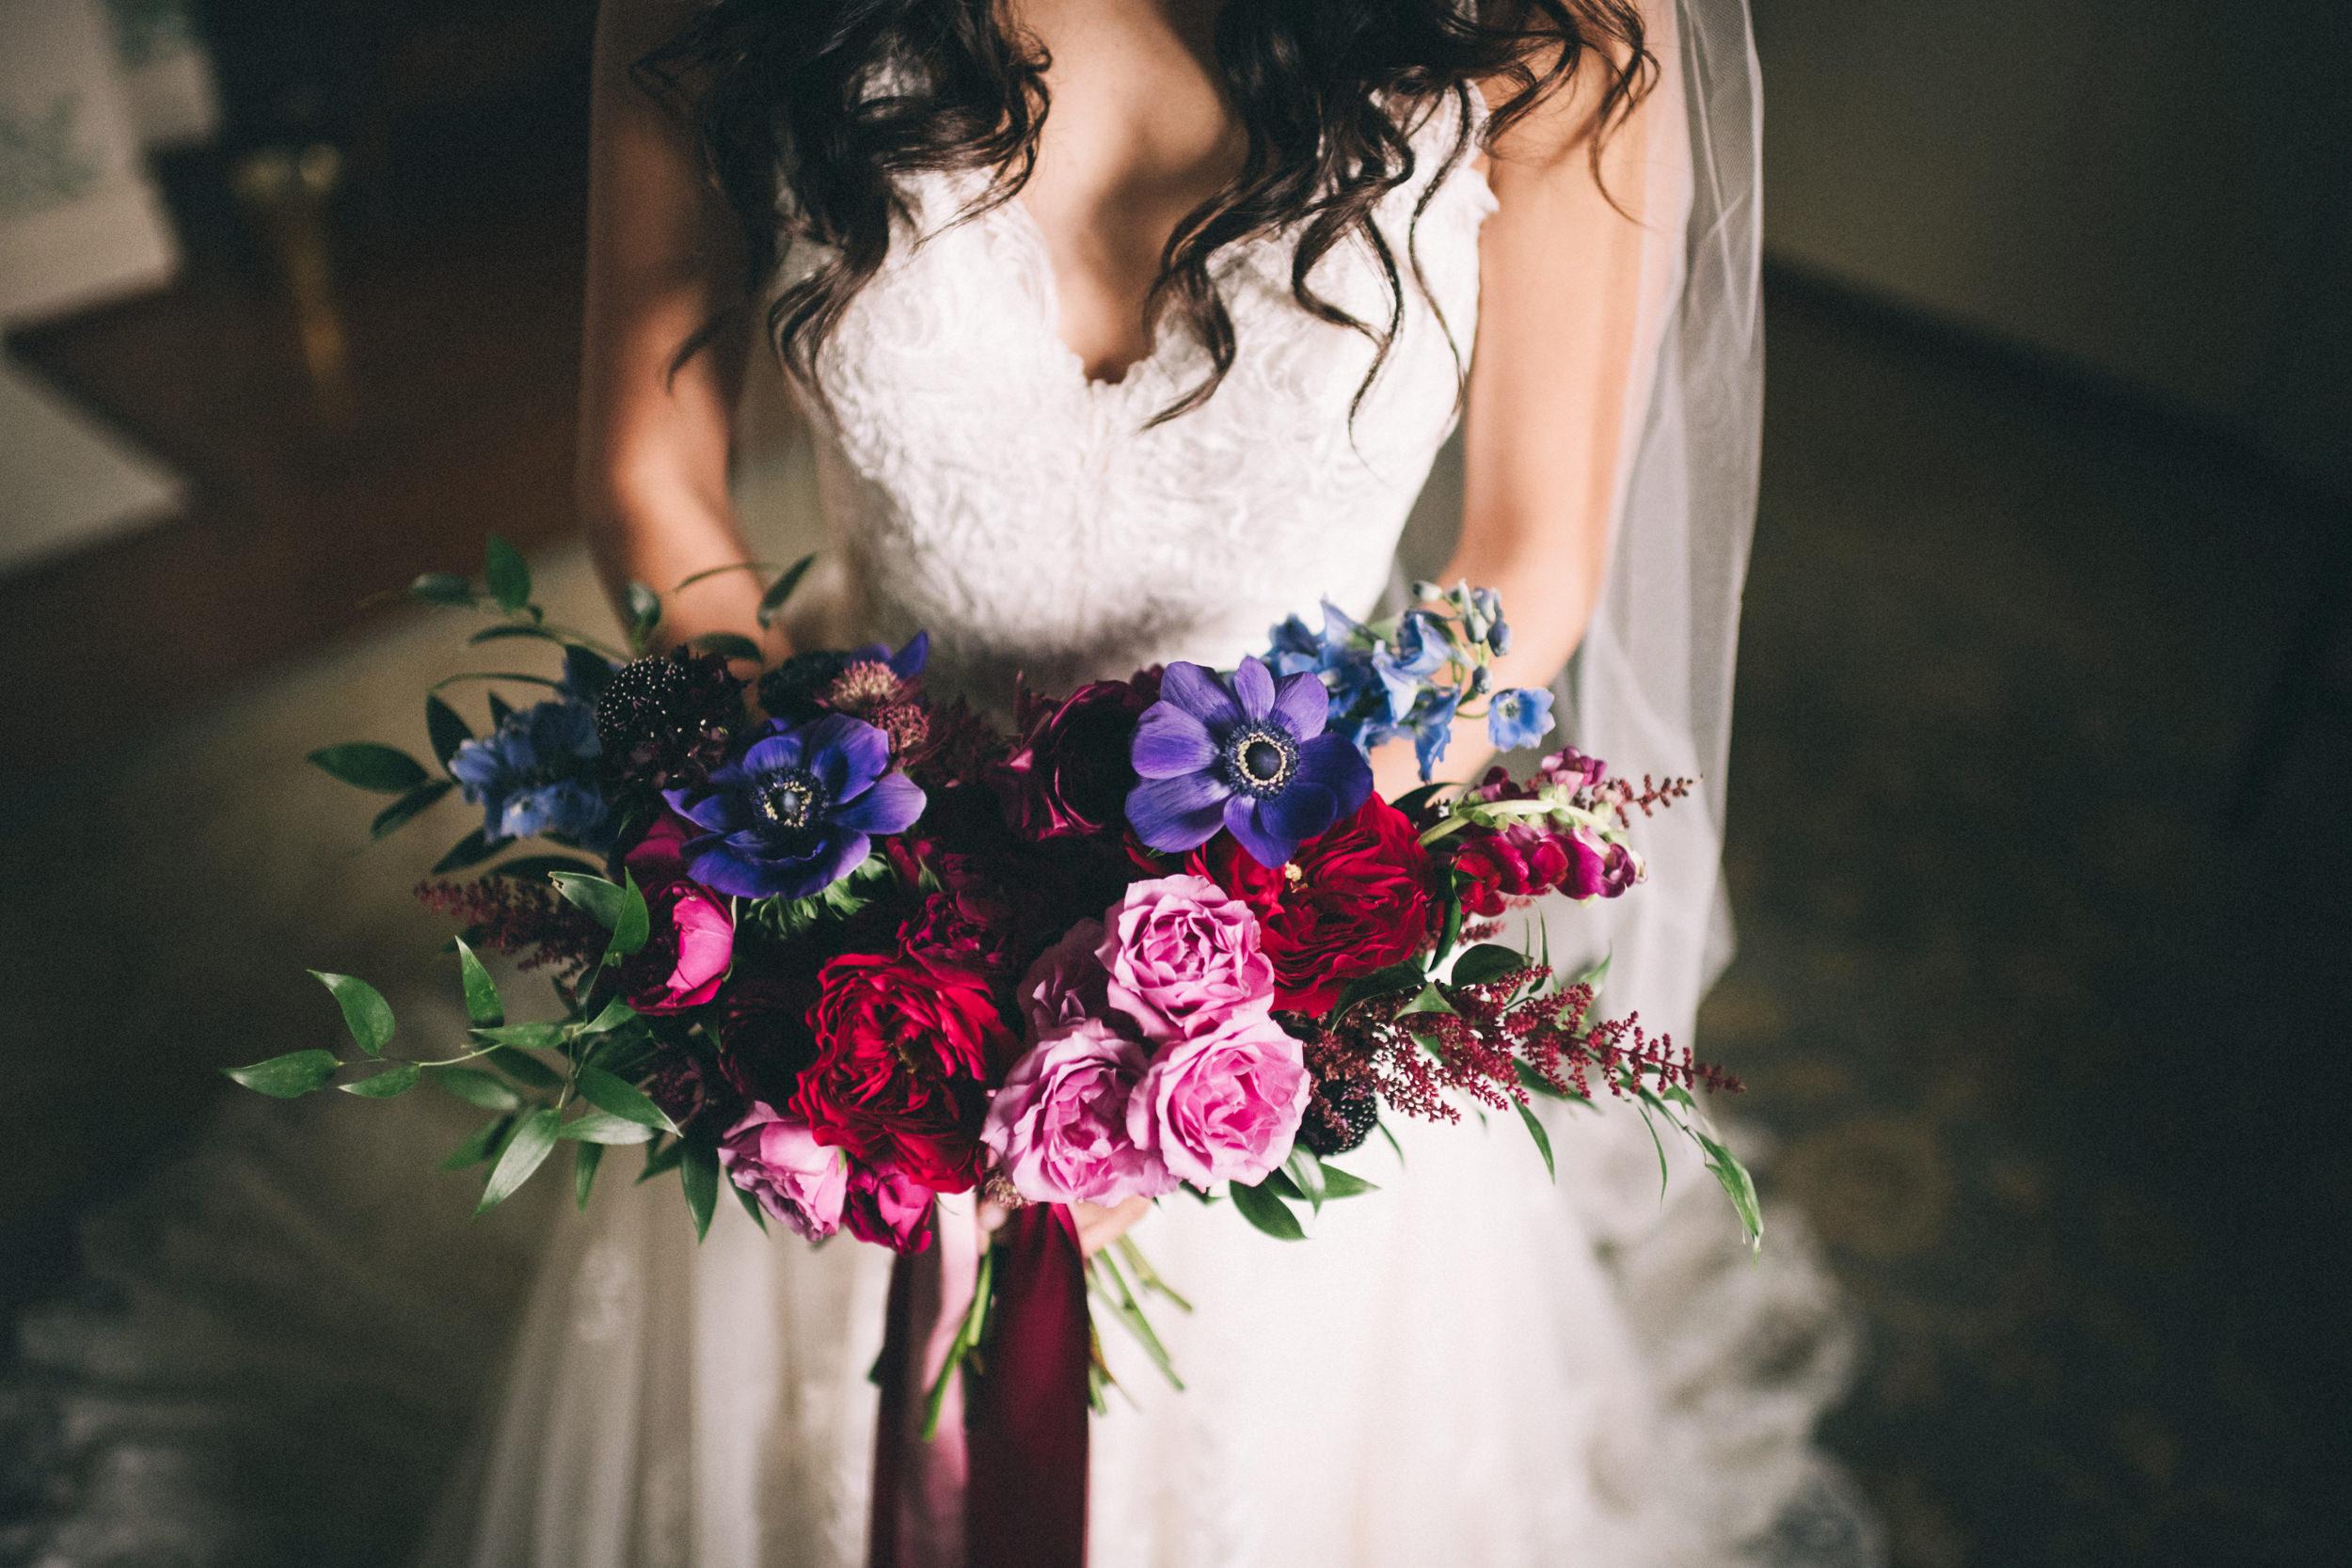 Louisville-Kentucky-Wedding-and-Elopement-Photographer-Sarah-Katherine-Davis-Photography-Summer-Jewel-Toned-Wedding-Chineese-Tea-Ceremony-Warrenwood-Manor-Danville-114.jpg